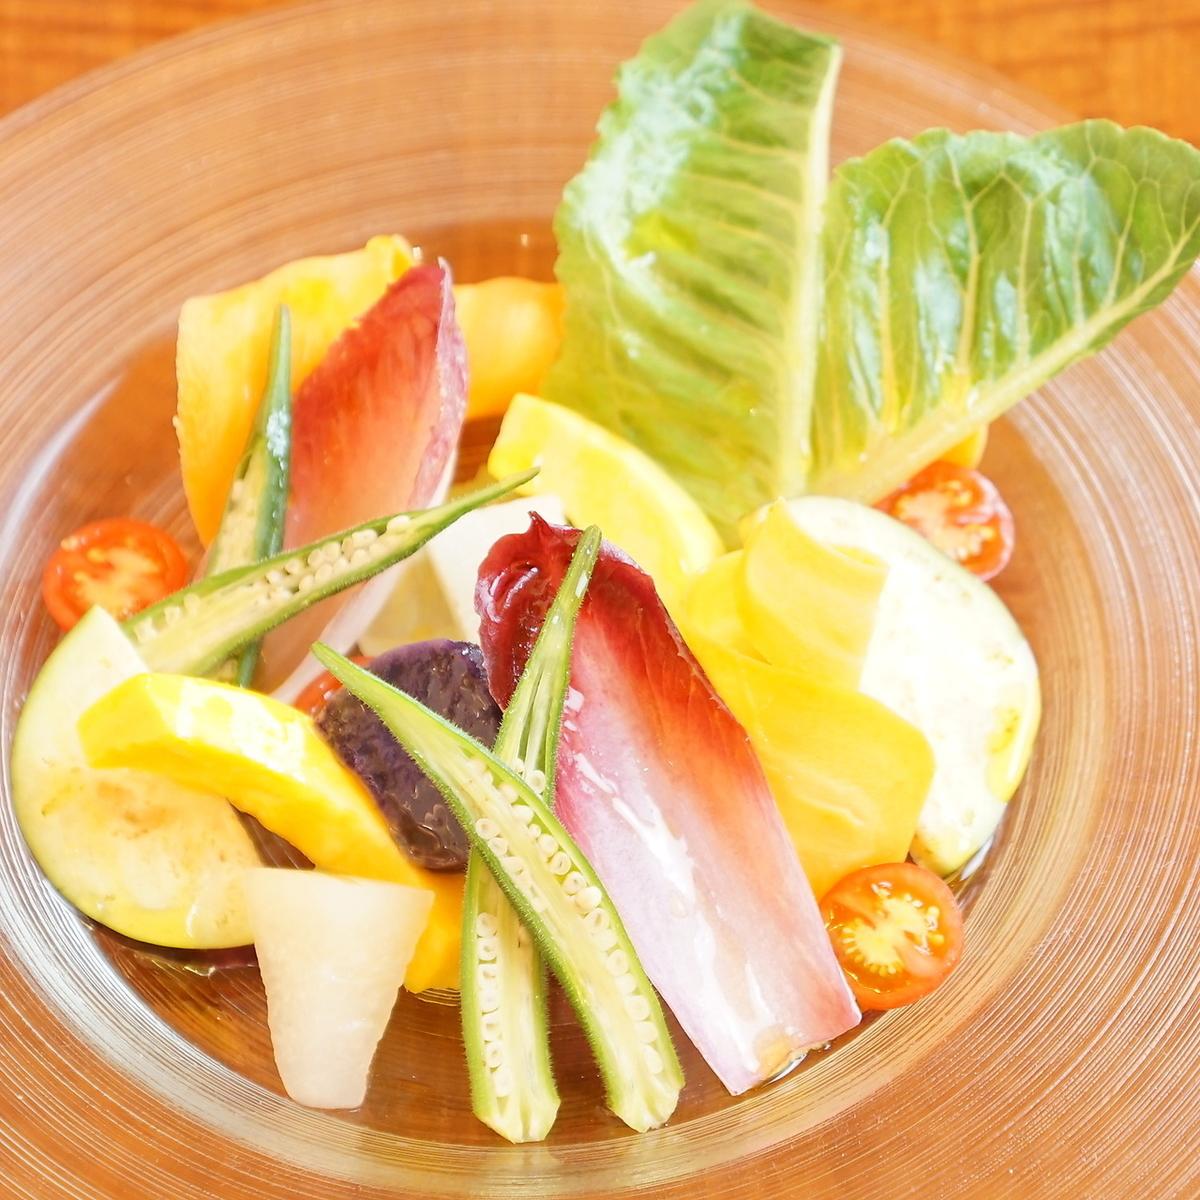 Simple salad of seasonal vegetables